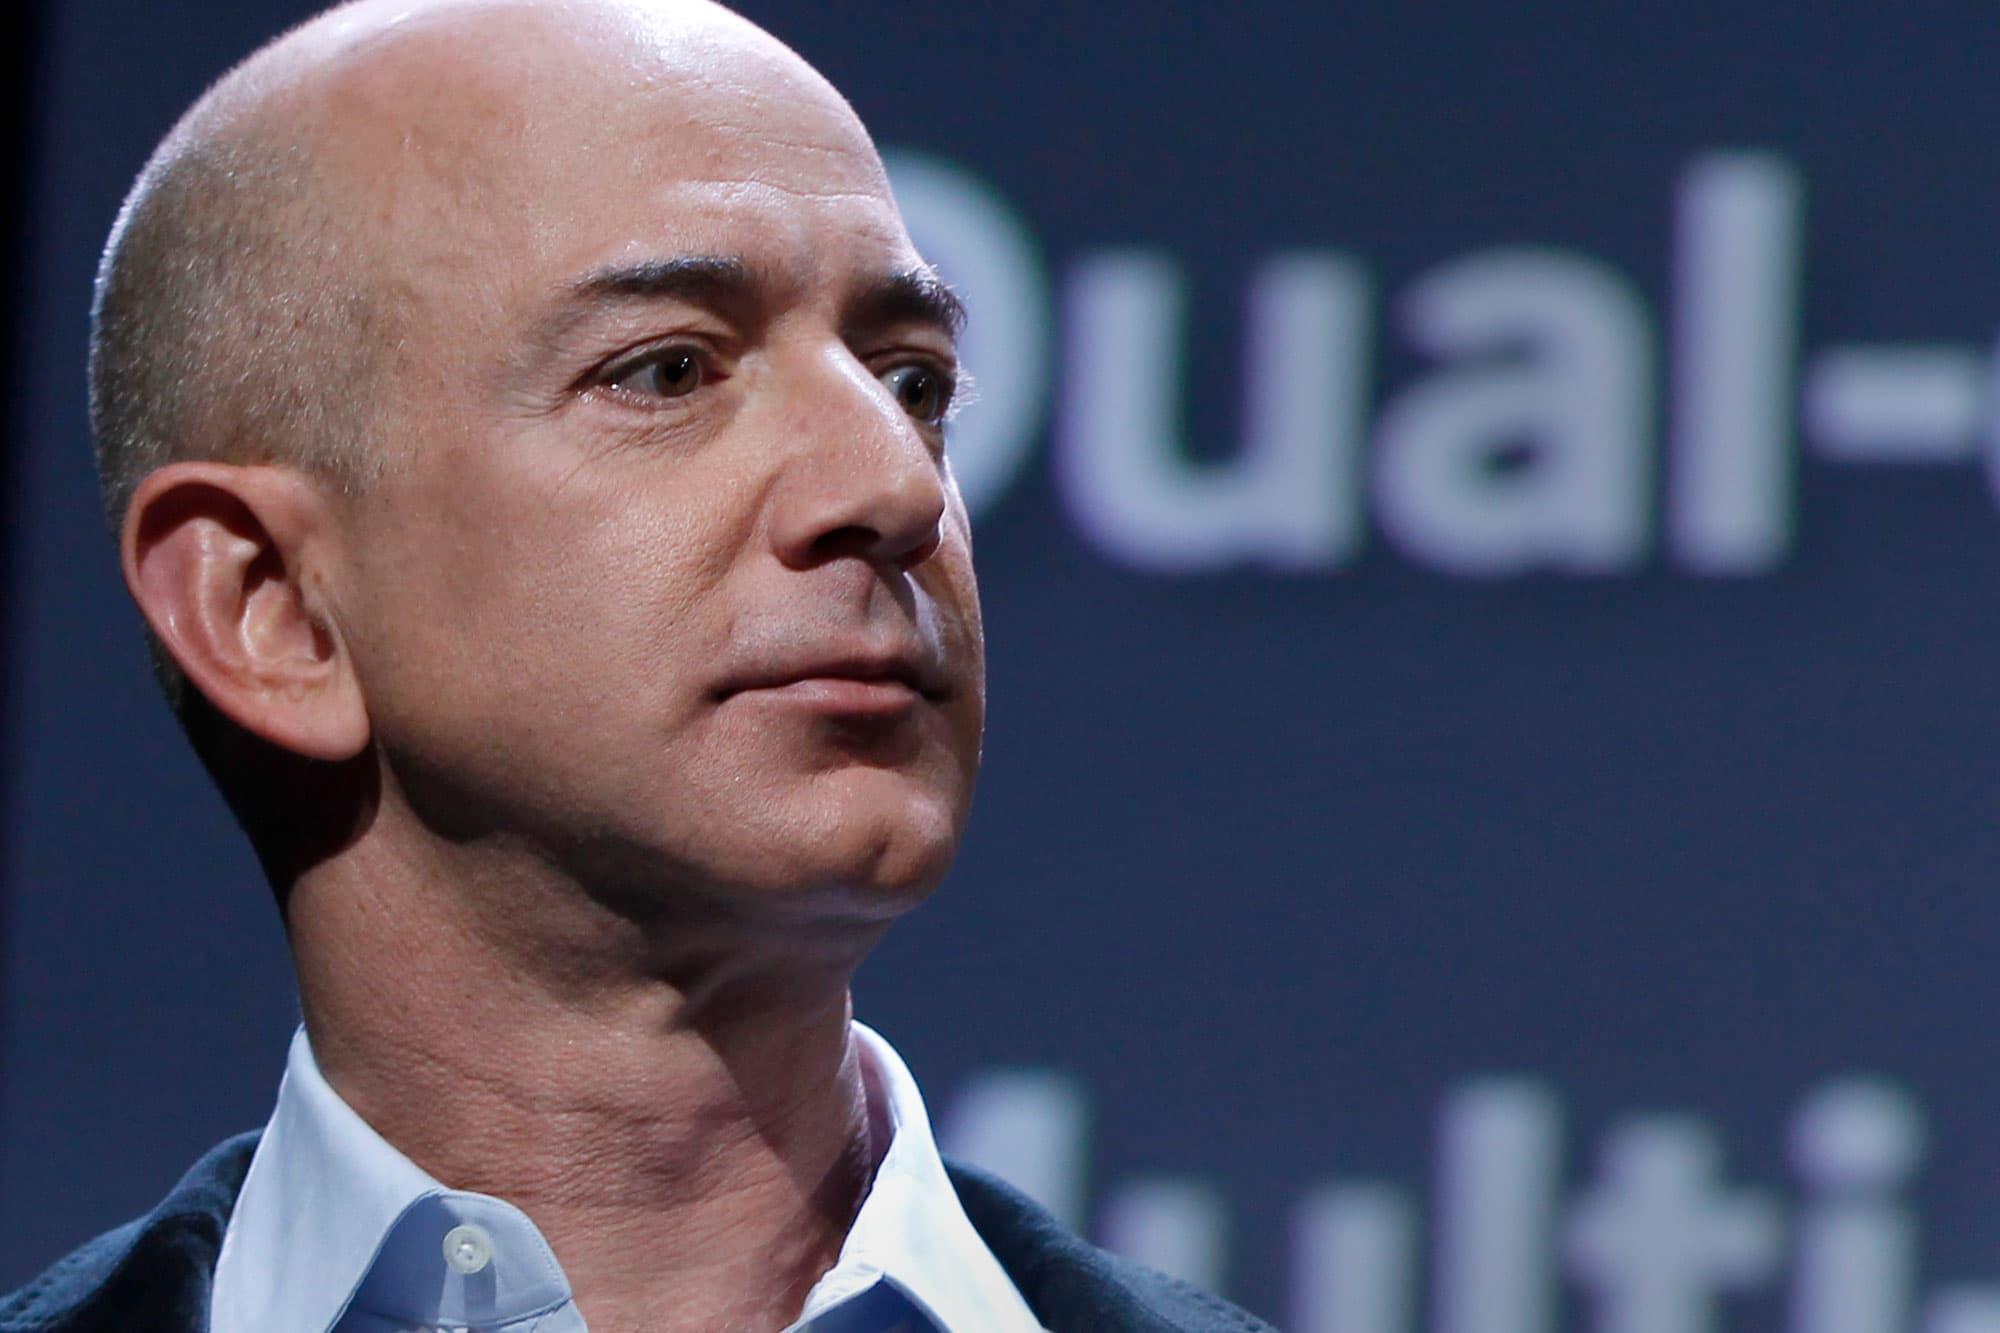 Amazon, Facebook and Google Tumble on Antitrust Concerns